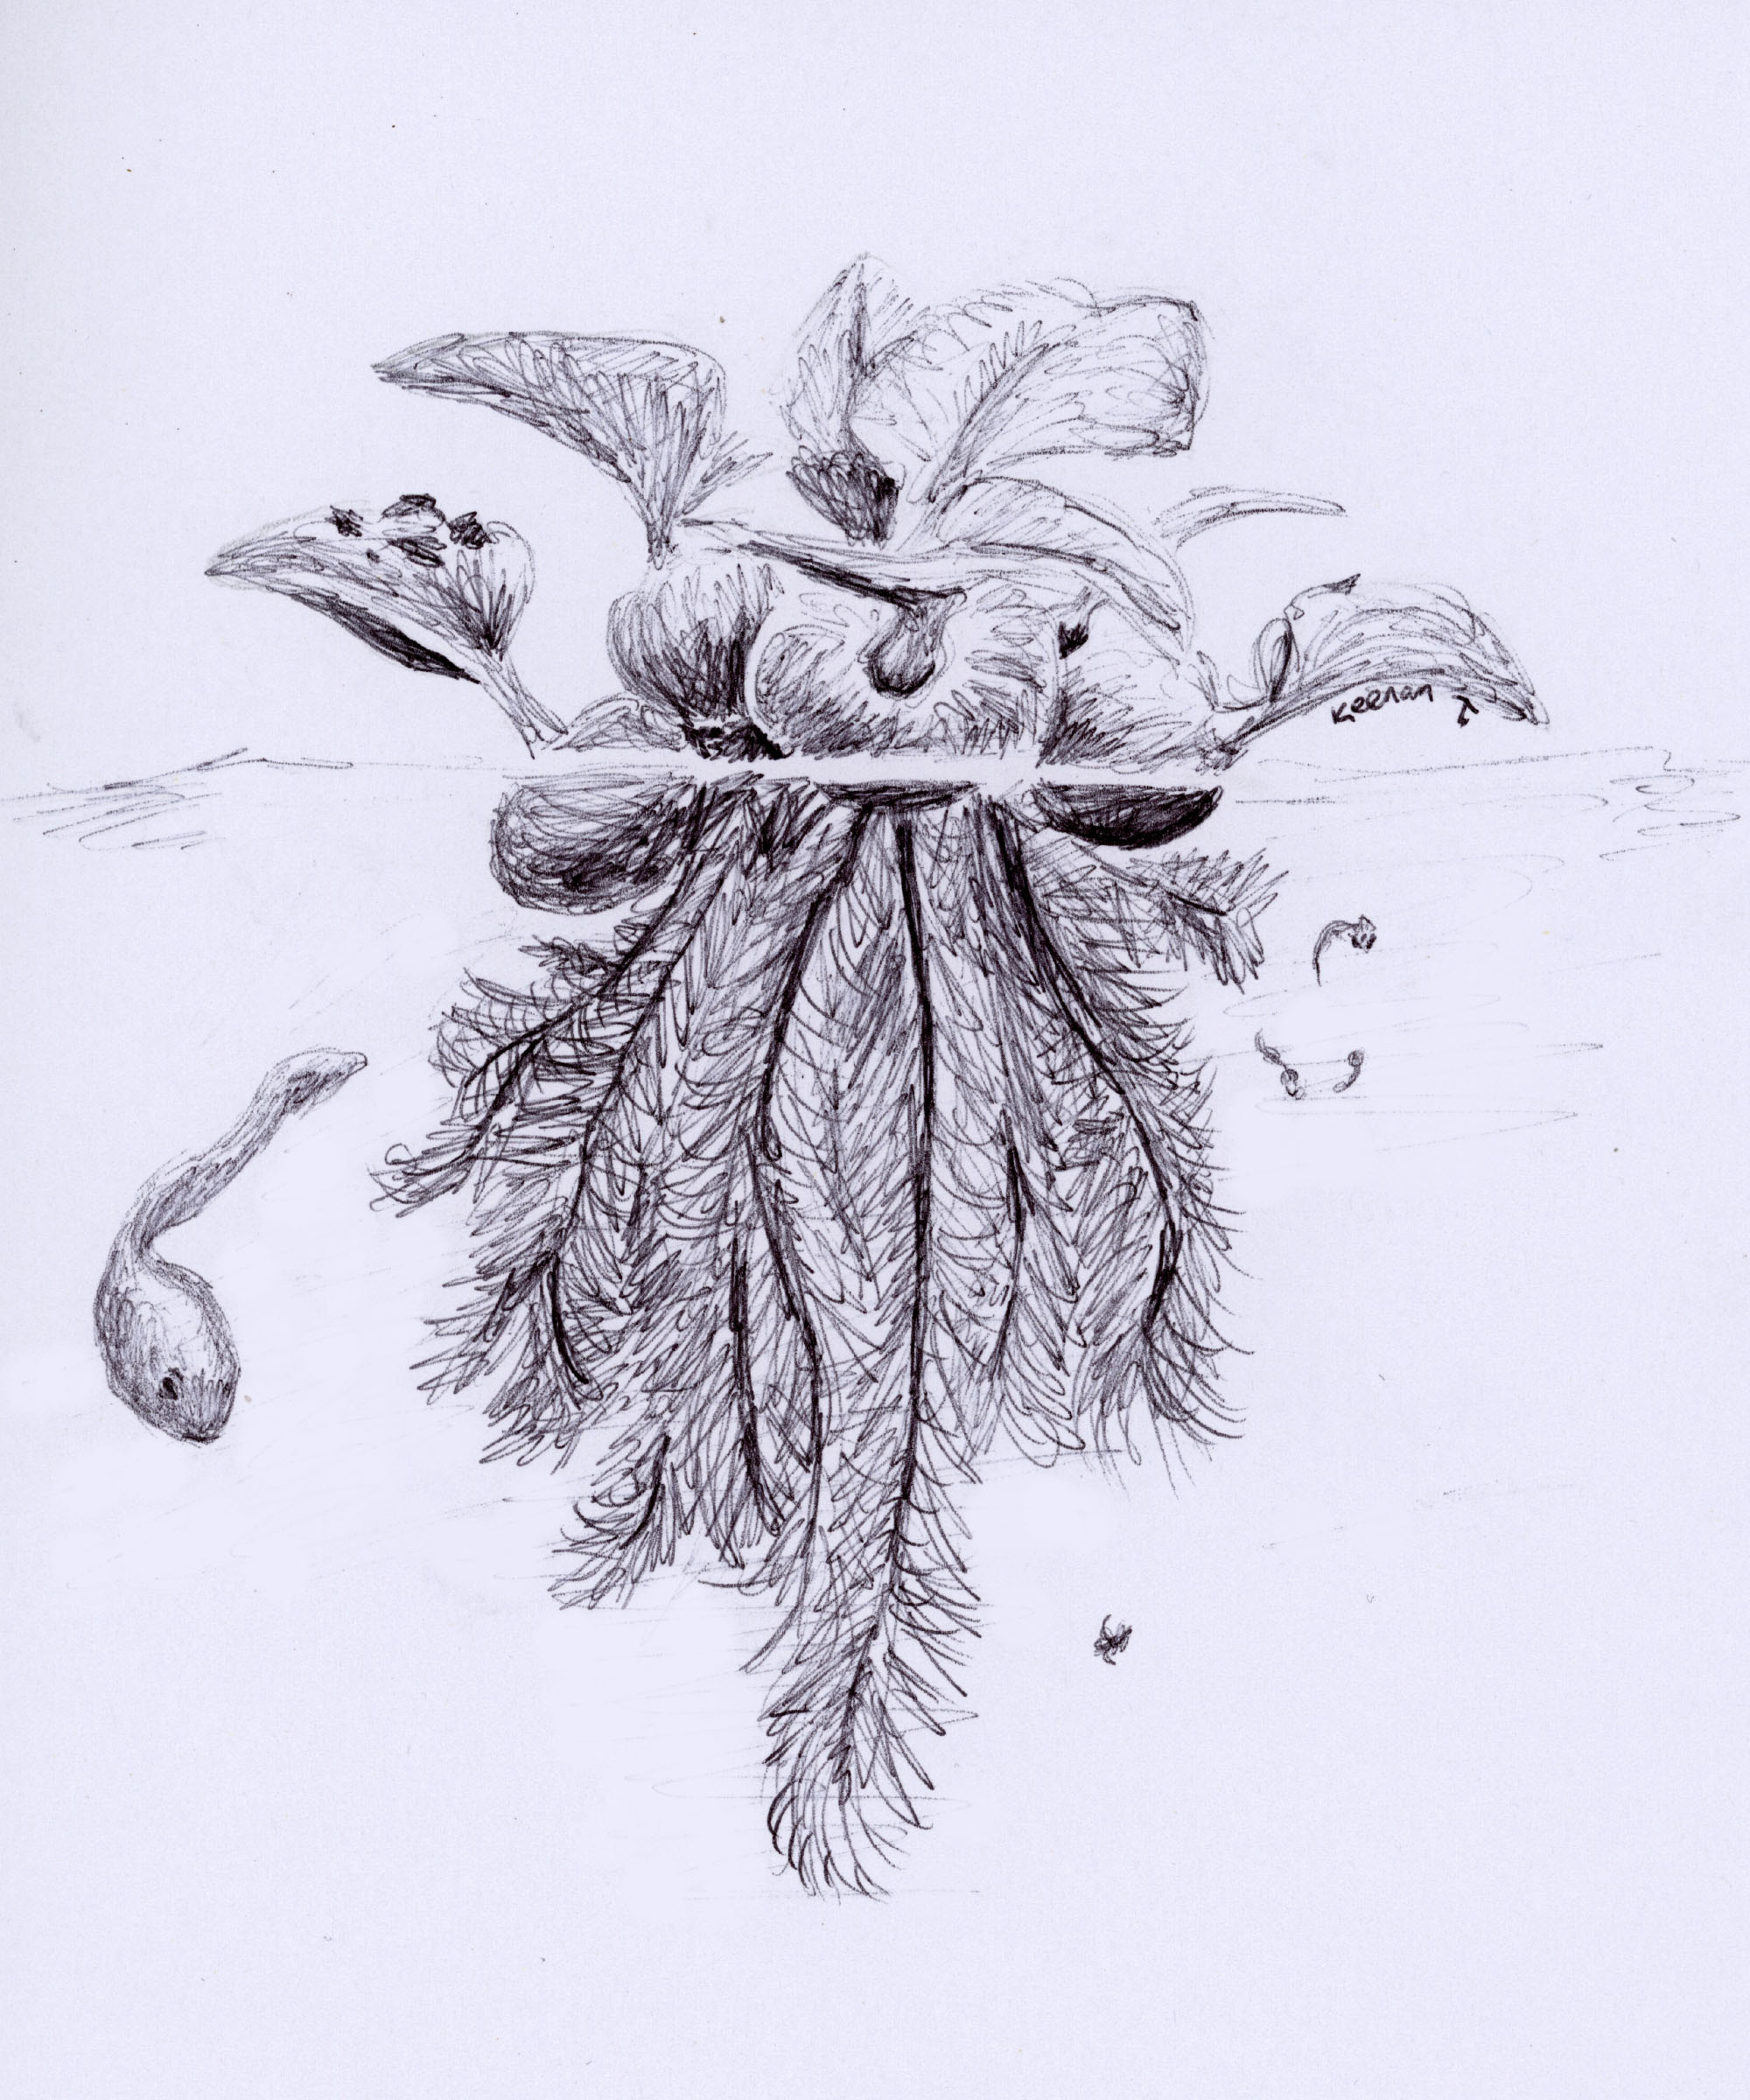 Water Hyacinth (Eichhornia crassipes)